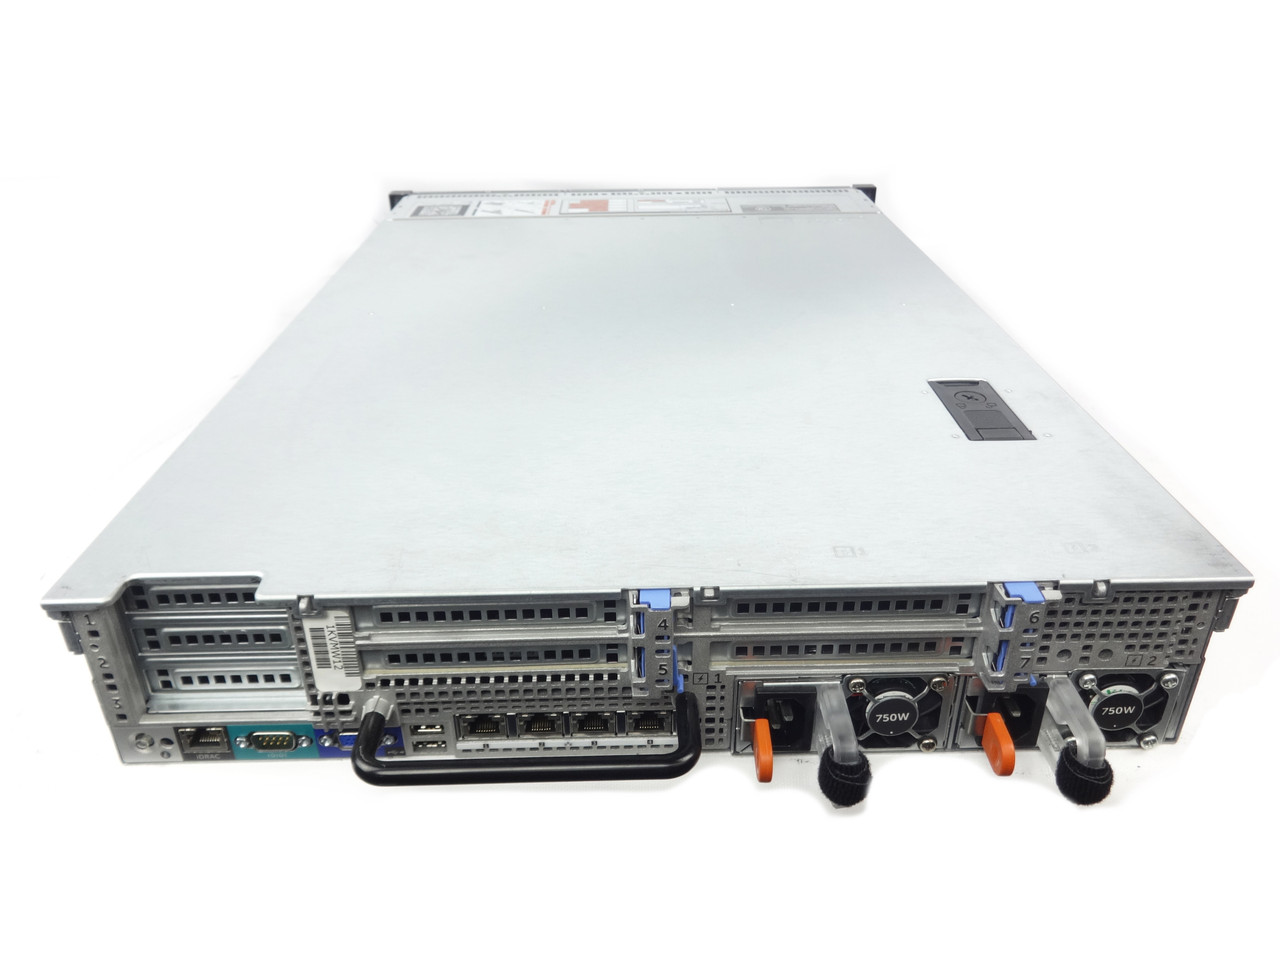 Dell Poweredge R720 16 Bay Server(Rear)